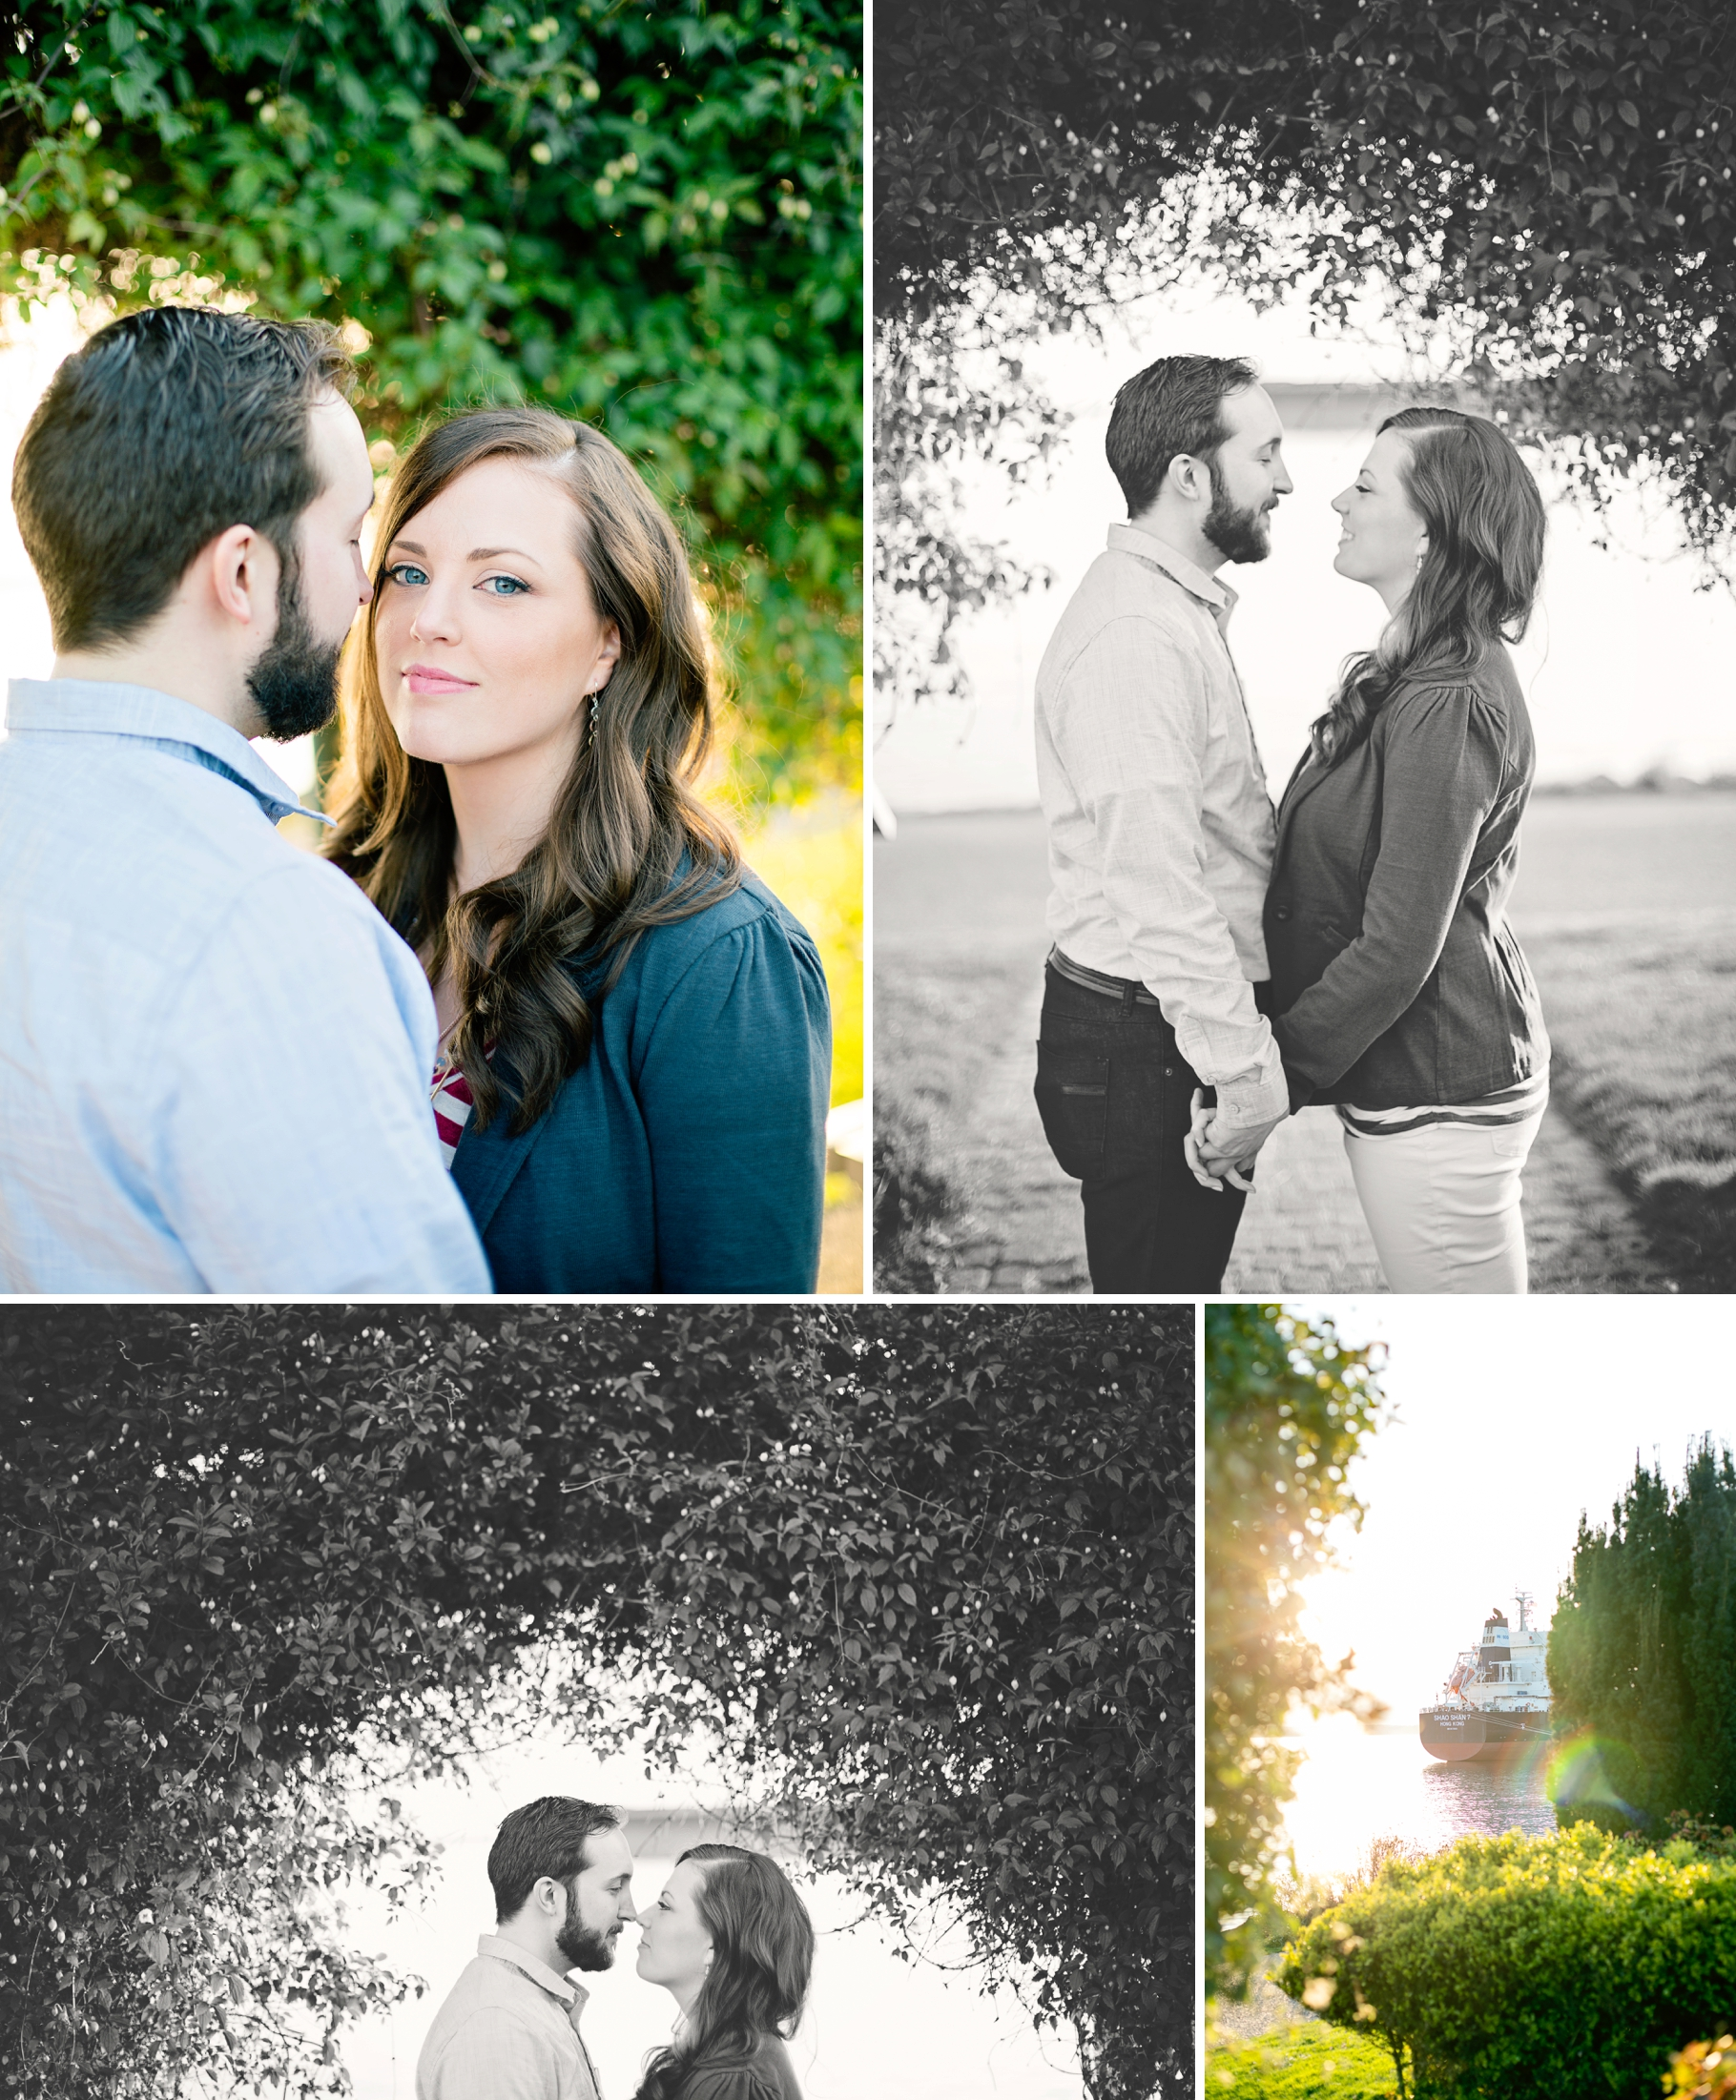 10-Engaged-Seattle-Waterfront-Elliot-Bay-Trail-Garden-Sunset-Romantic-Photographer-Wedding-Photography-by-Betty-Elaine